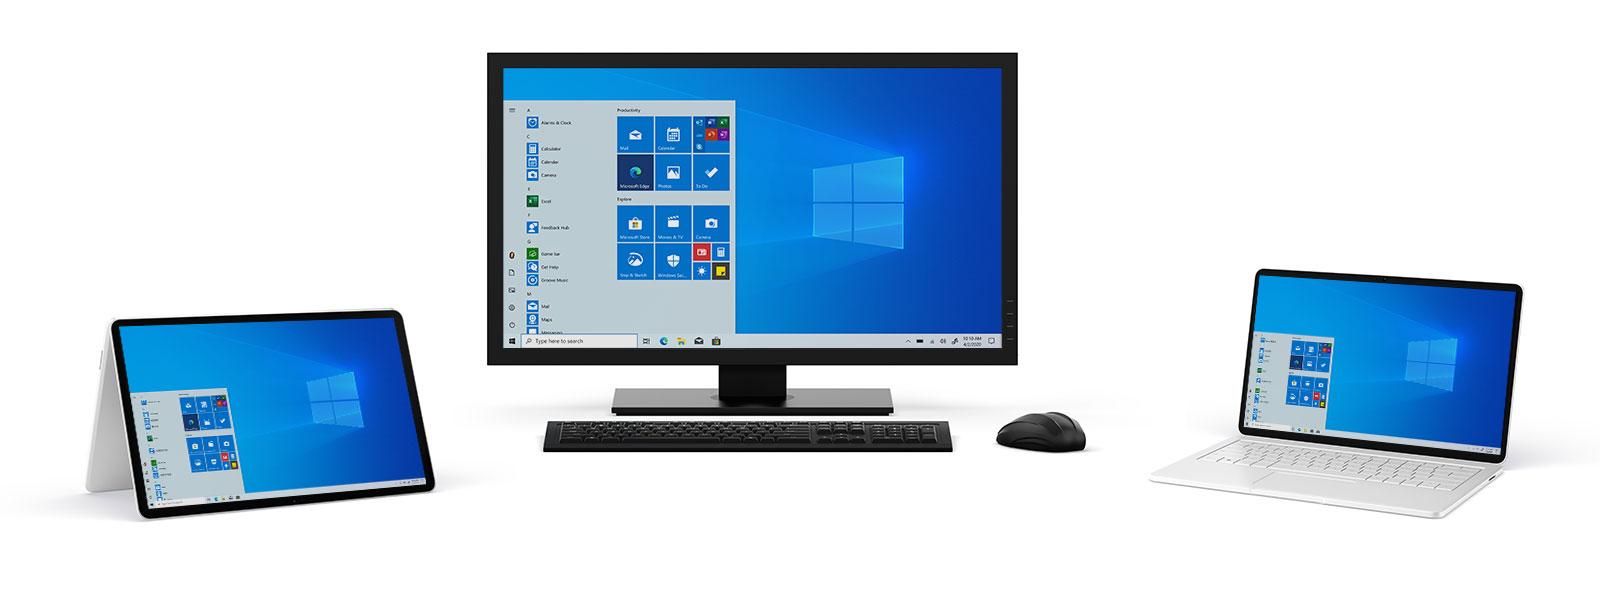 Plusieurs appareils Windows 10